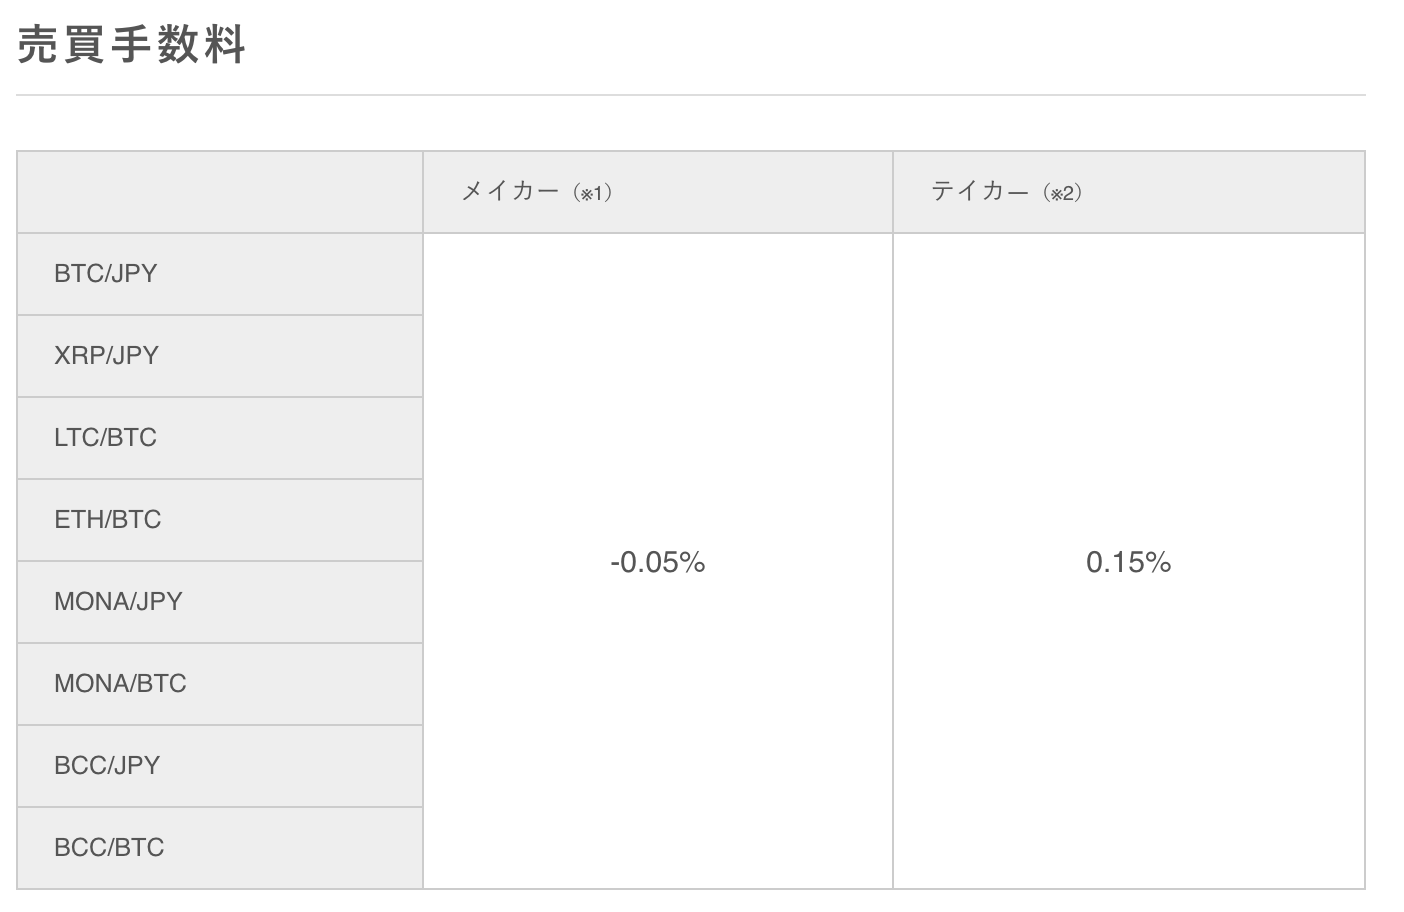 bitbankの取引手数料